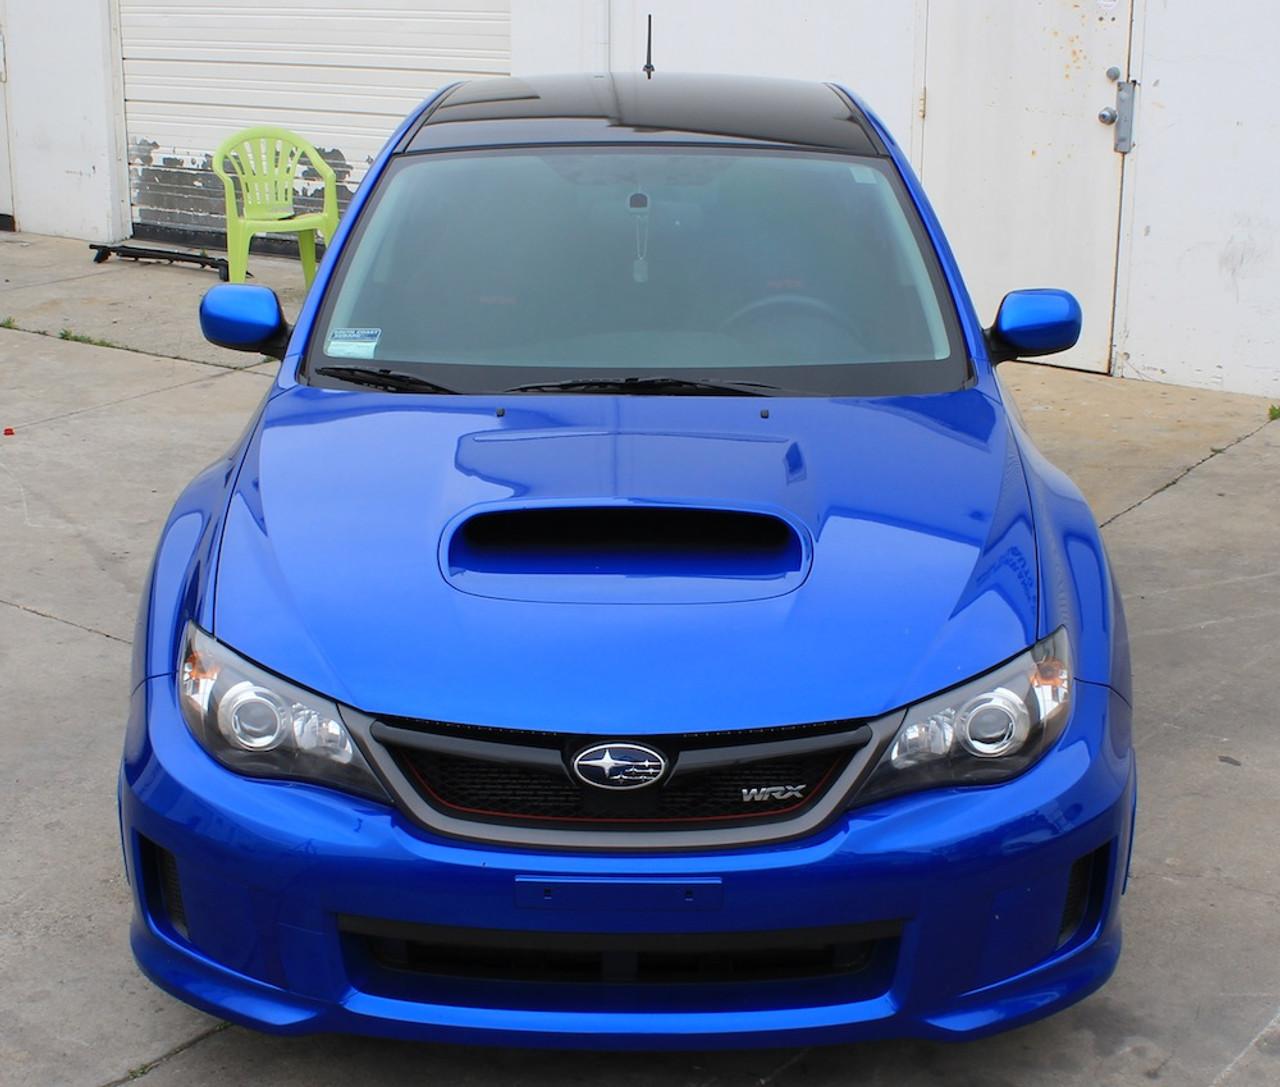 2008 - 2014 Subaru WRX Hatchback Vinyl Roof Wrap Kit (GLOSSY, SATIN, CARBON)